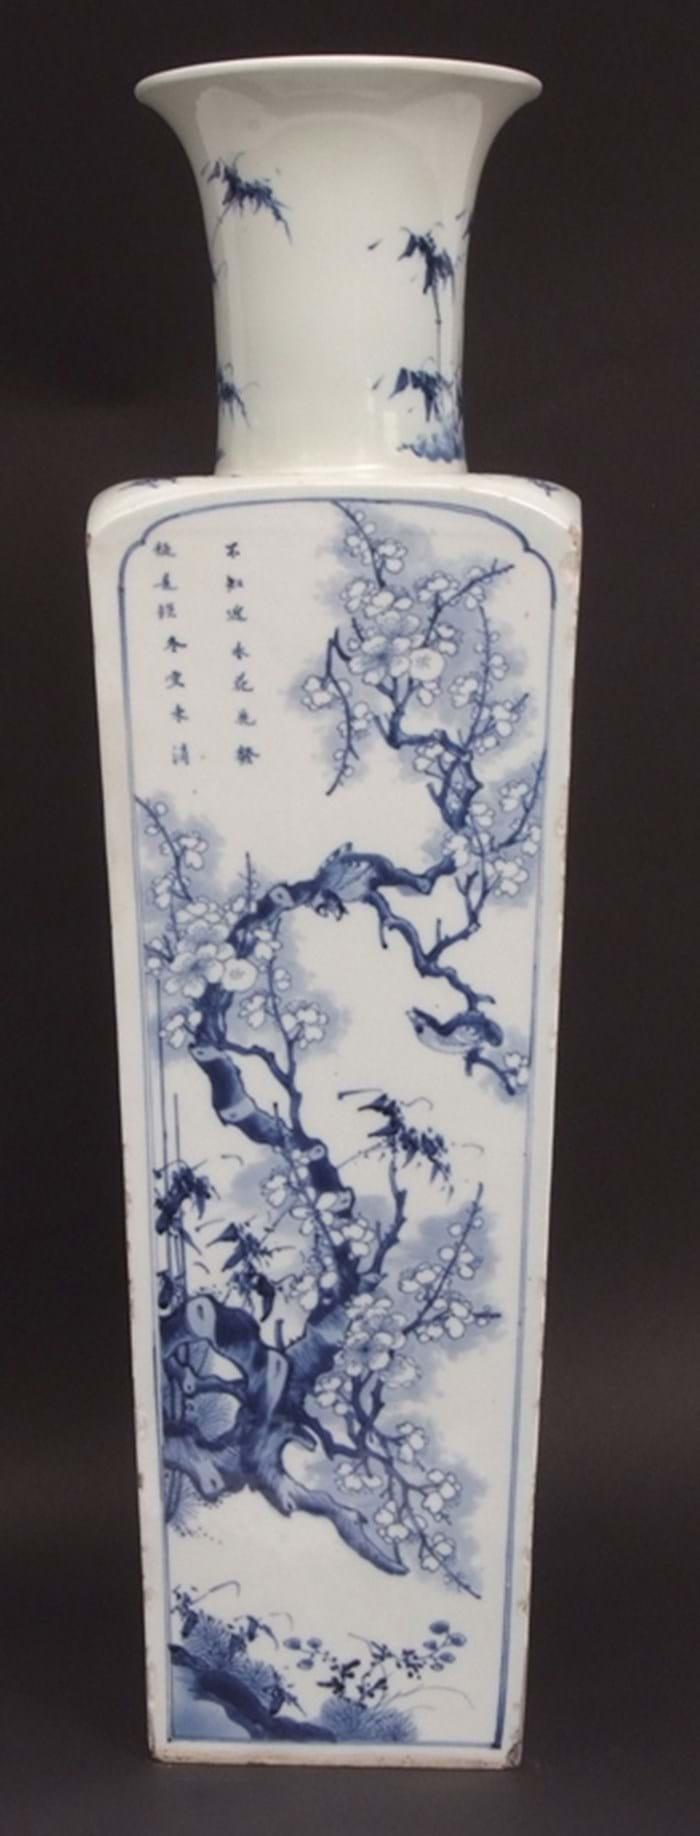 Kangxi vase with reign mark